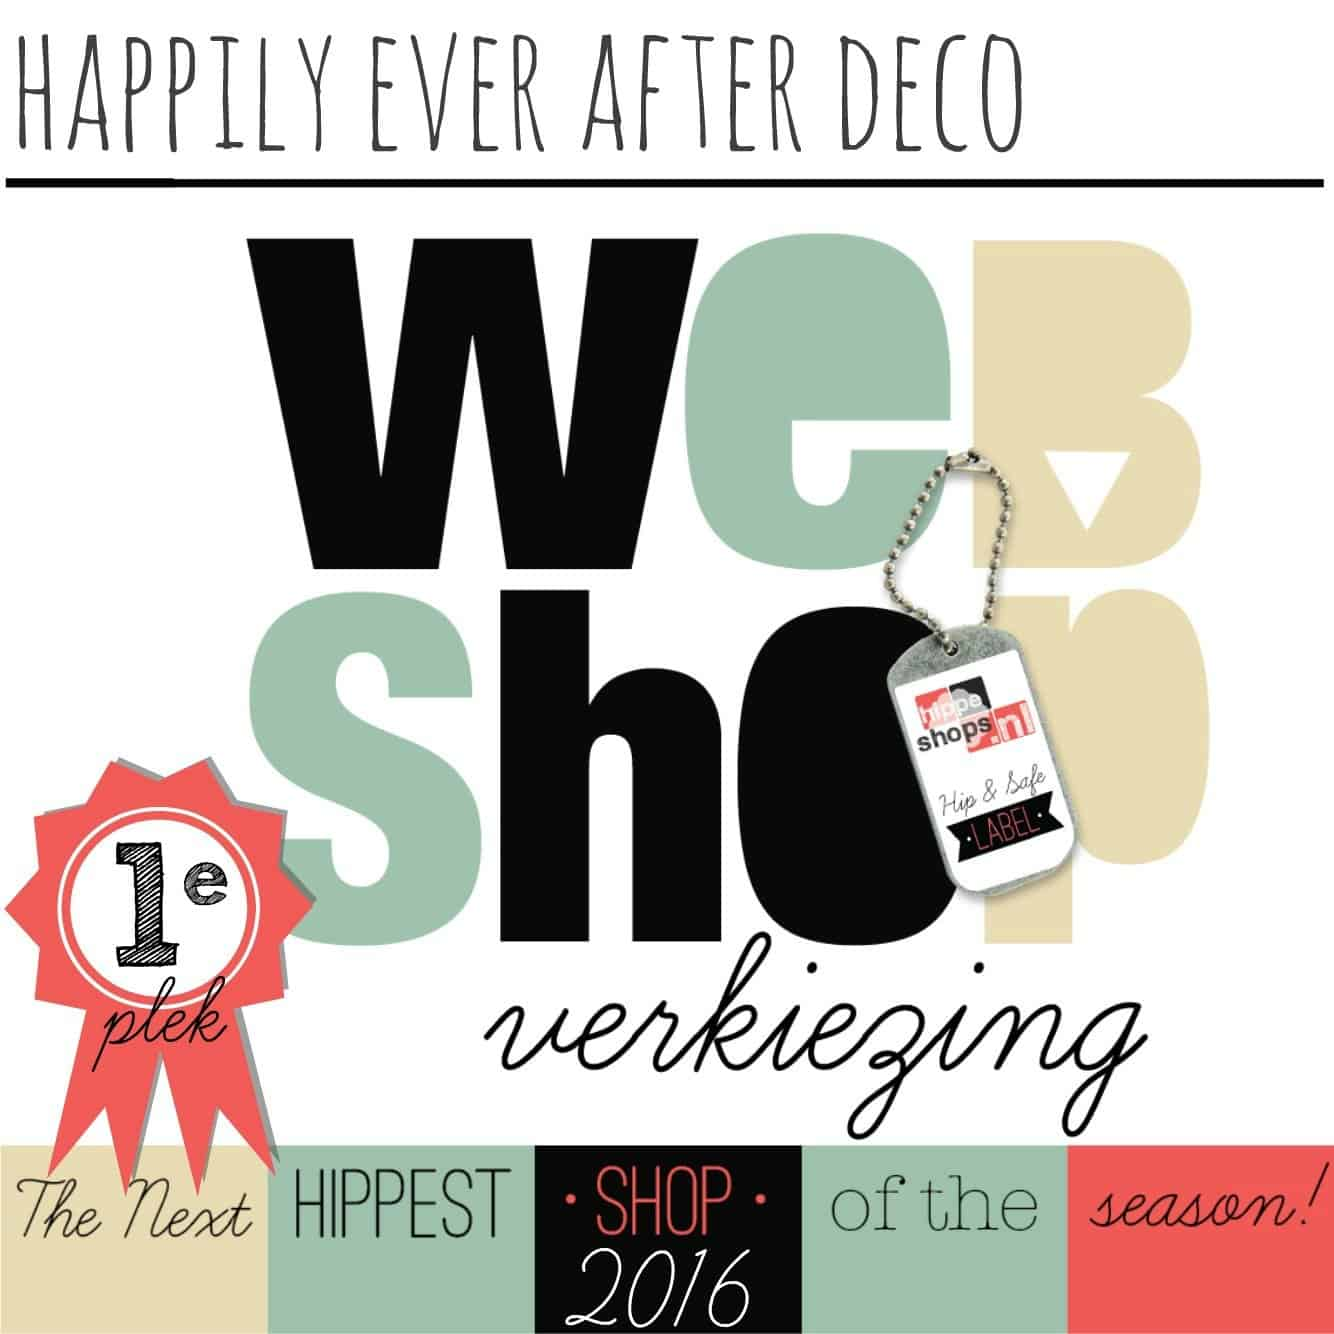 Happily Ever After Deco wint de 'Next Hippest Shop 2016 Webshopverkiezing'